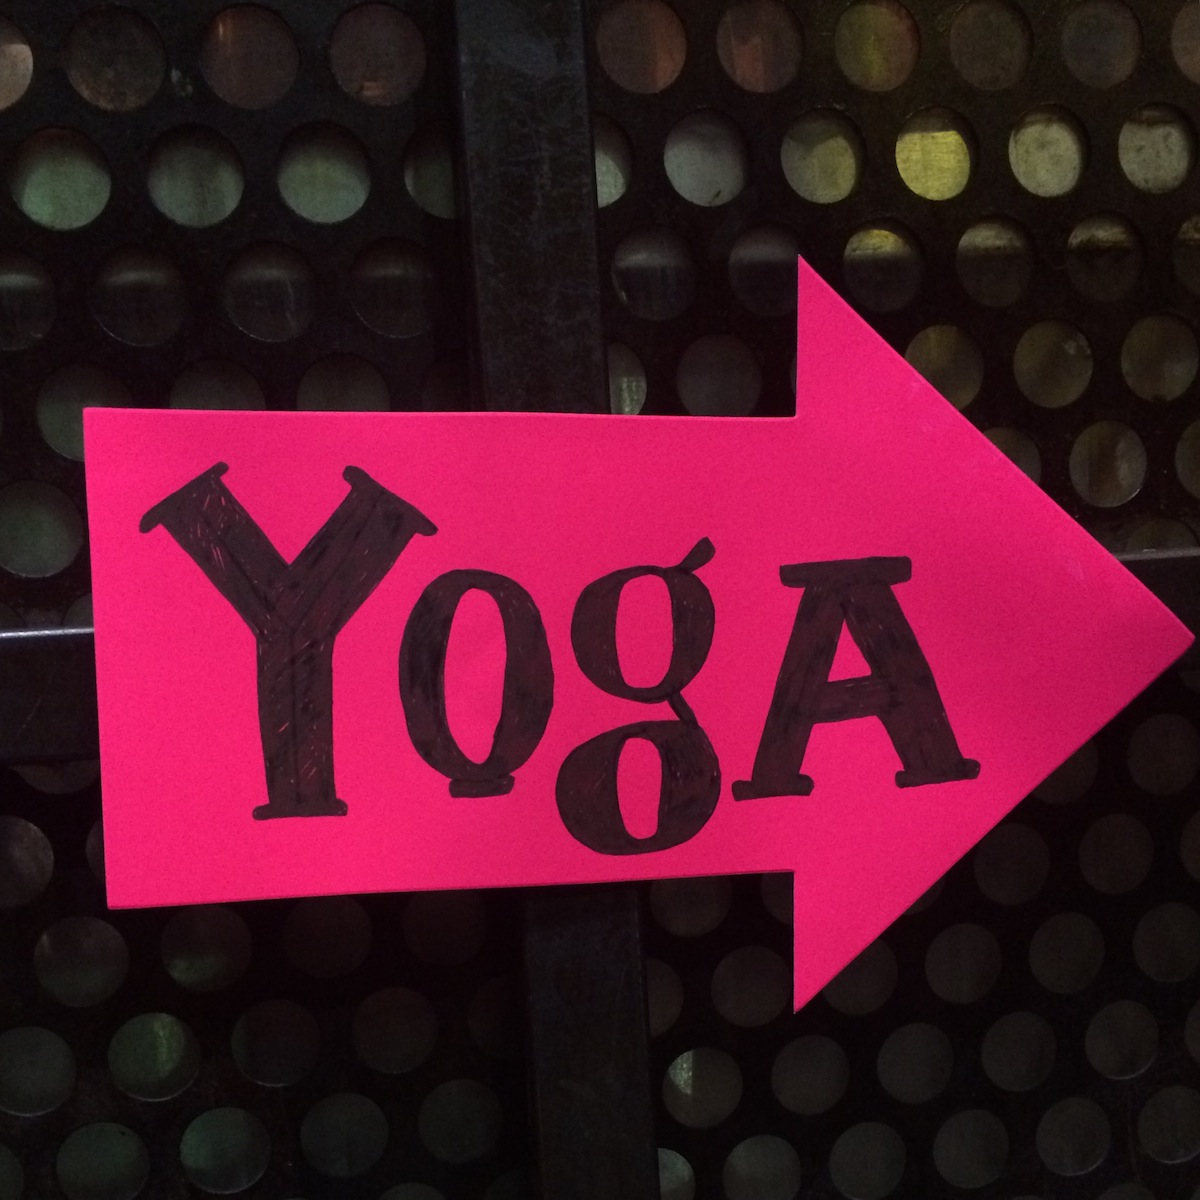 Morning Gloryville Yoga